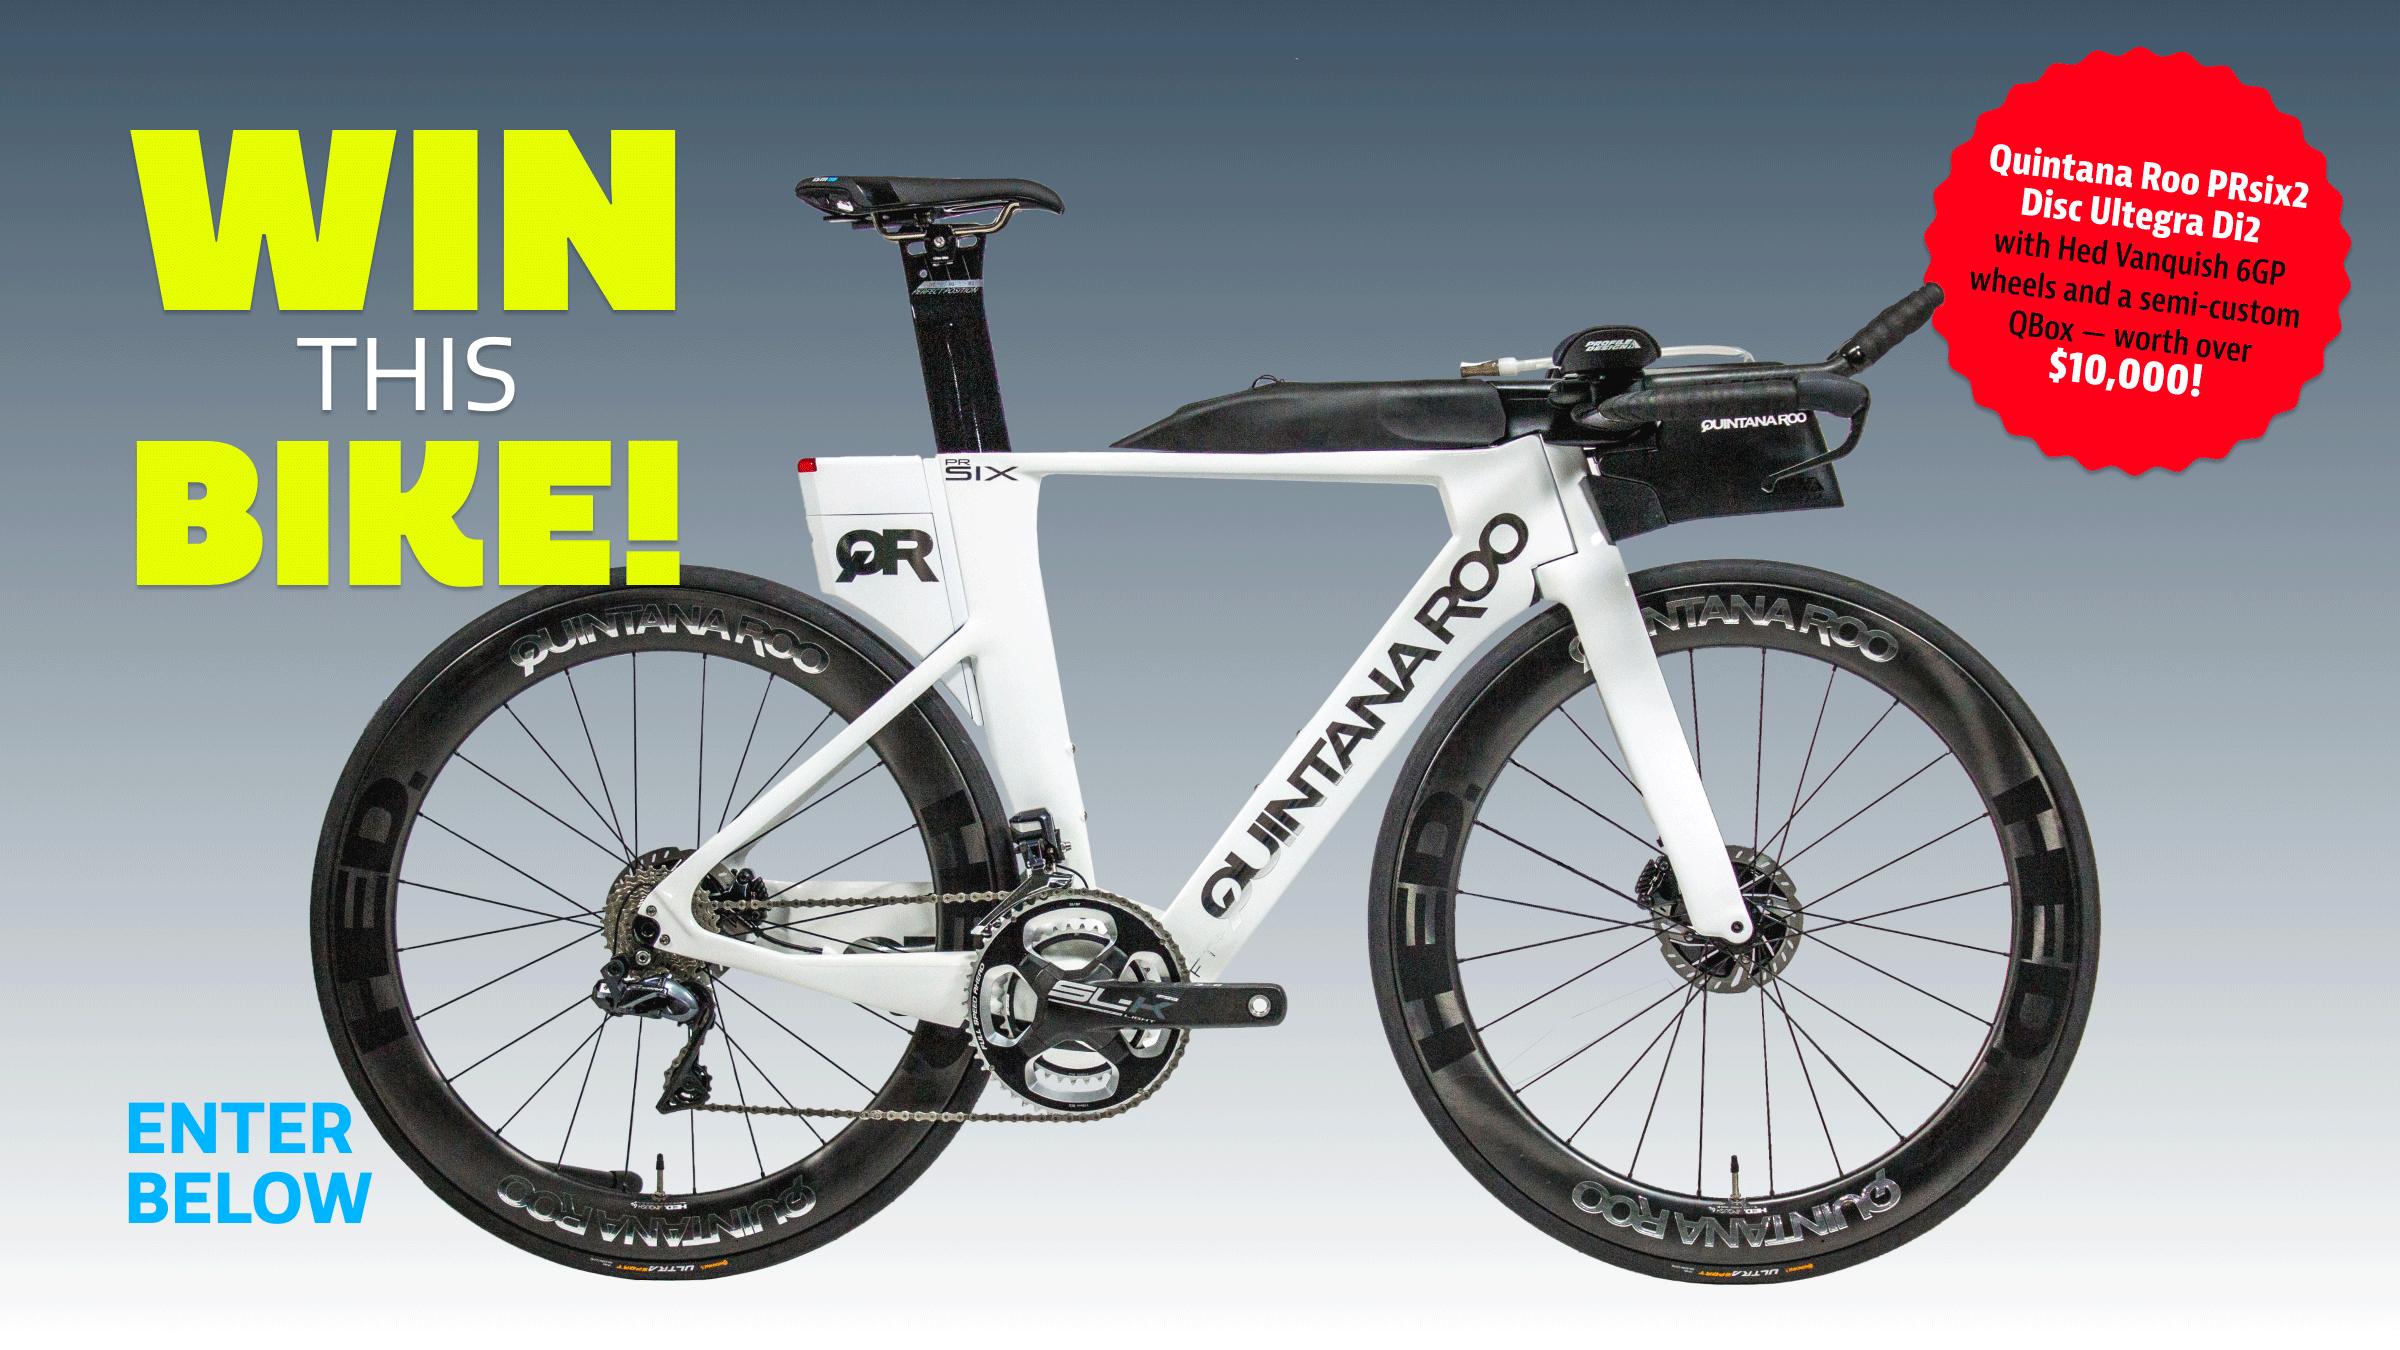 Triathlete Win This Bike! Contest Quintana Roo PRsix2